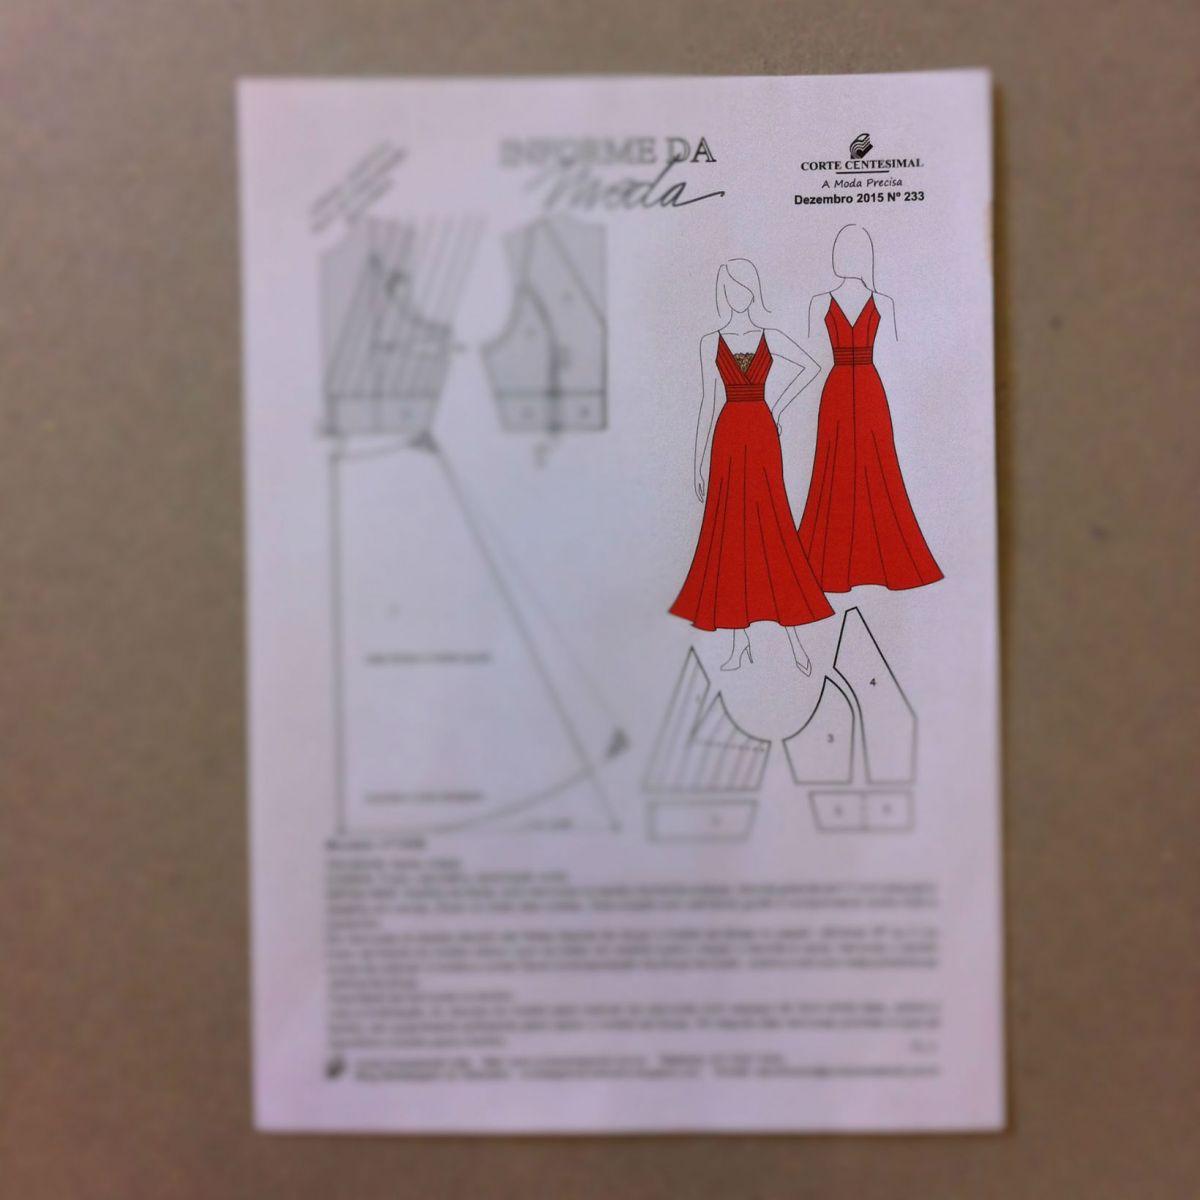 Informe da Moda 233  - Corte Centesimal